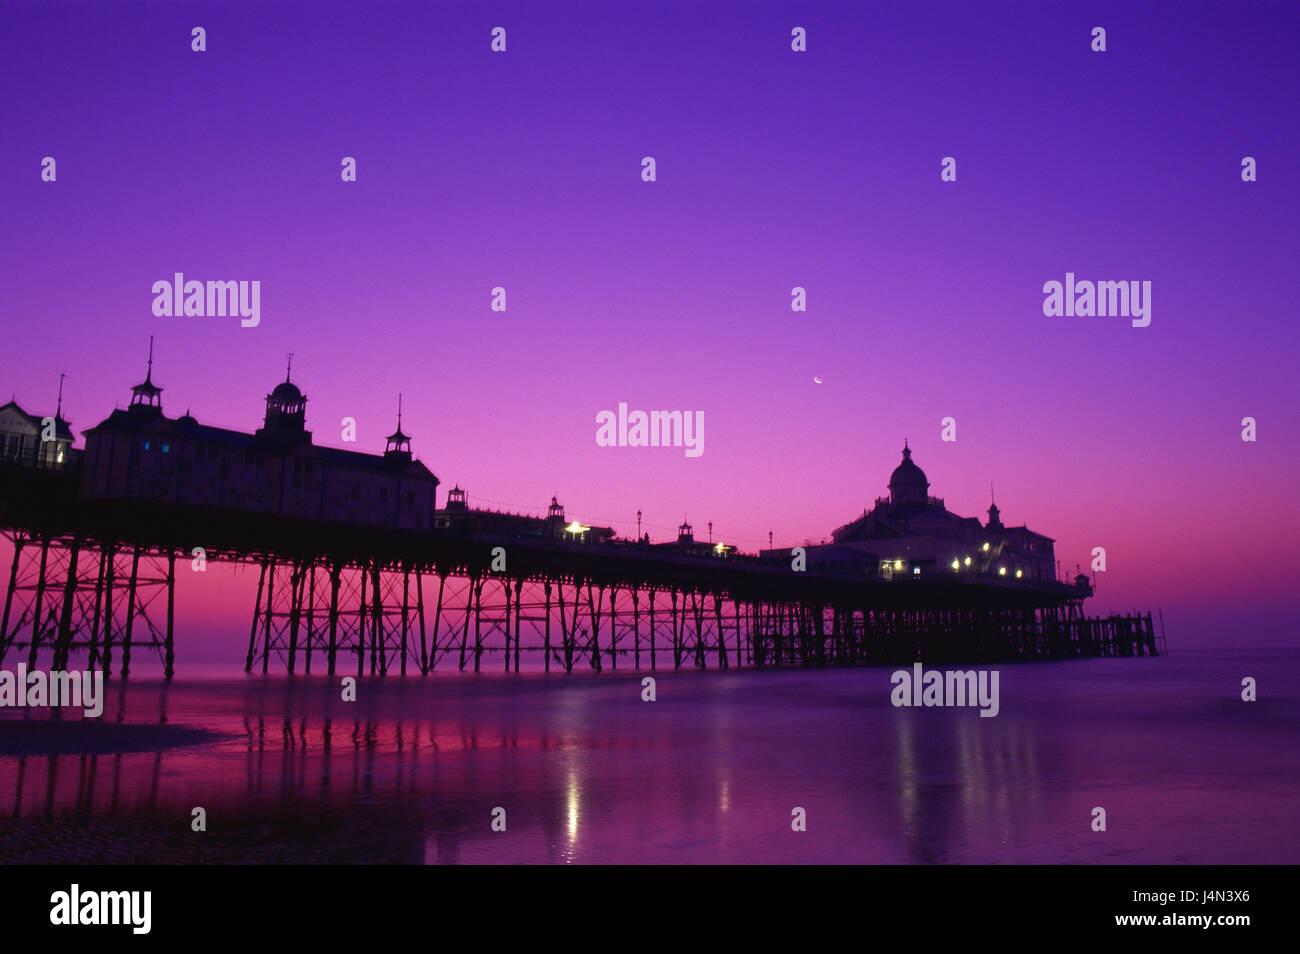 La Grande-Bretagne, l'Angleterre, dans le Sussex, Eastbourne, Pier, silhouette, soir, tuning Photo Stock